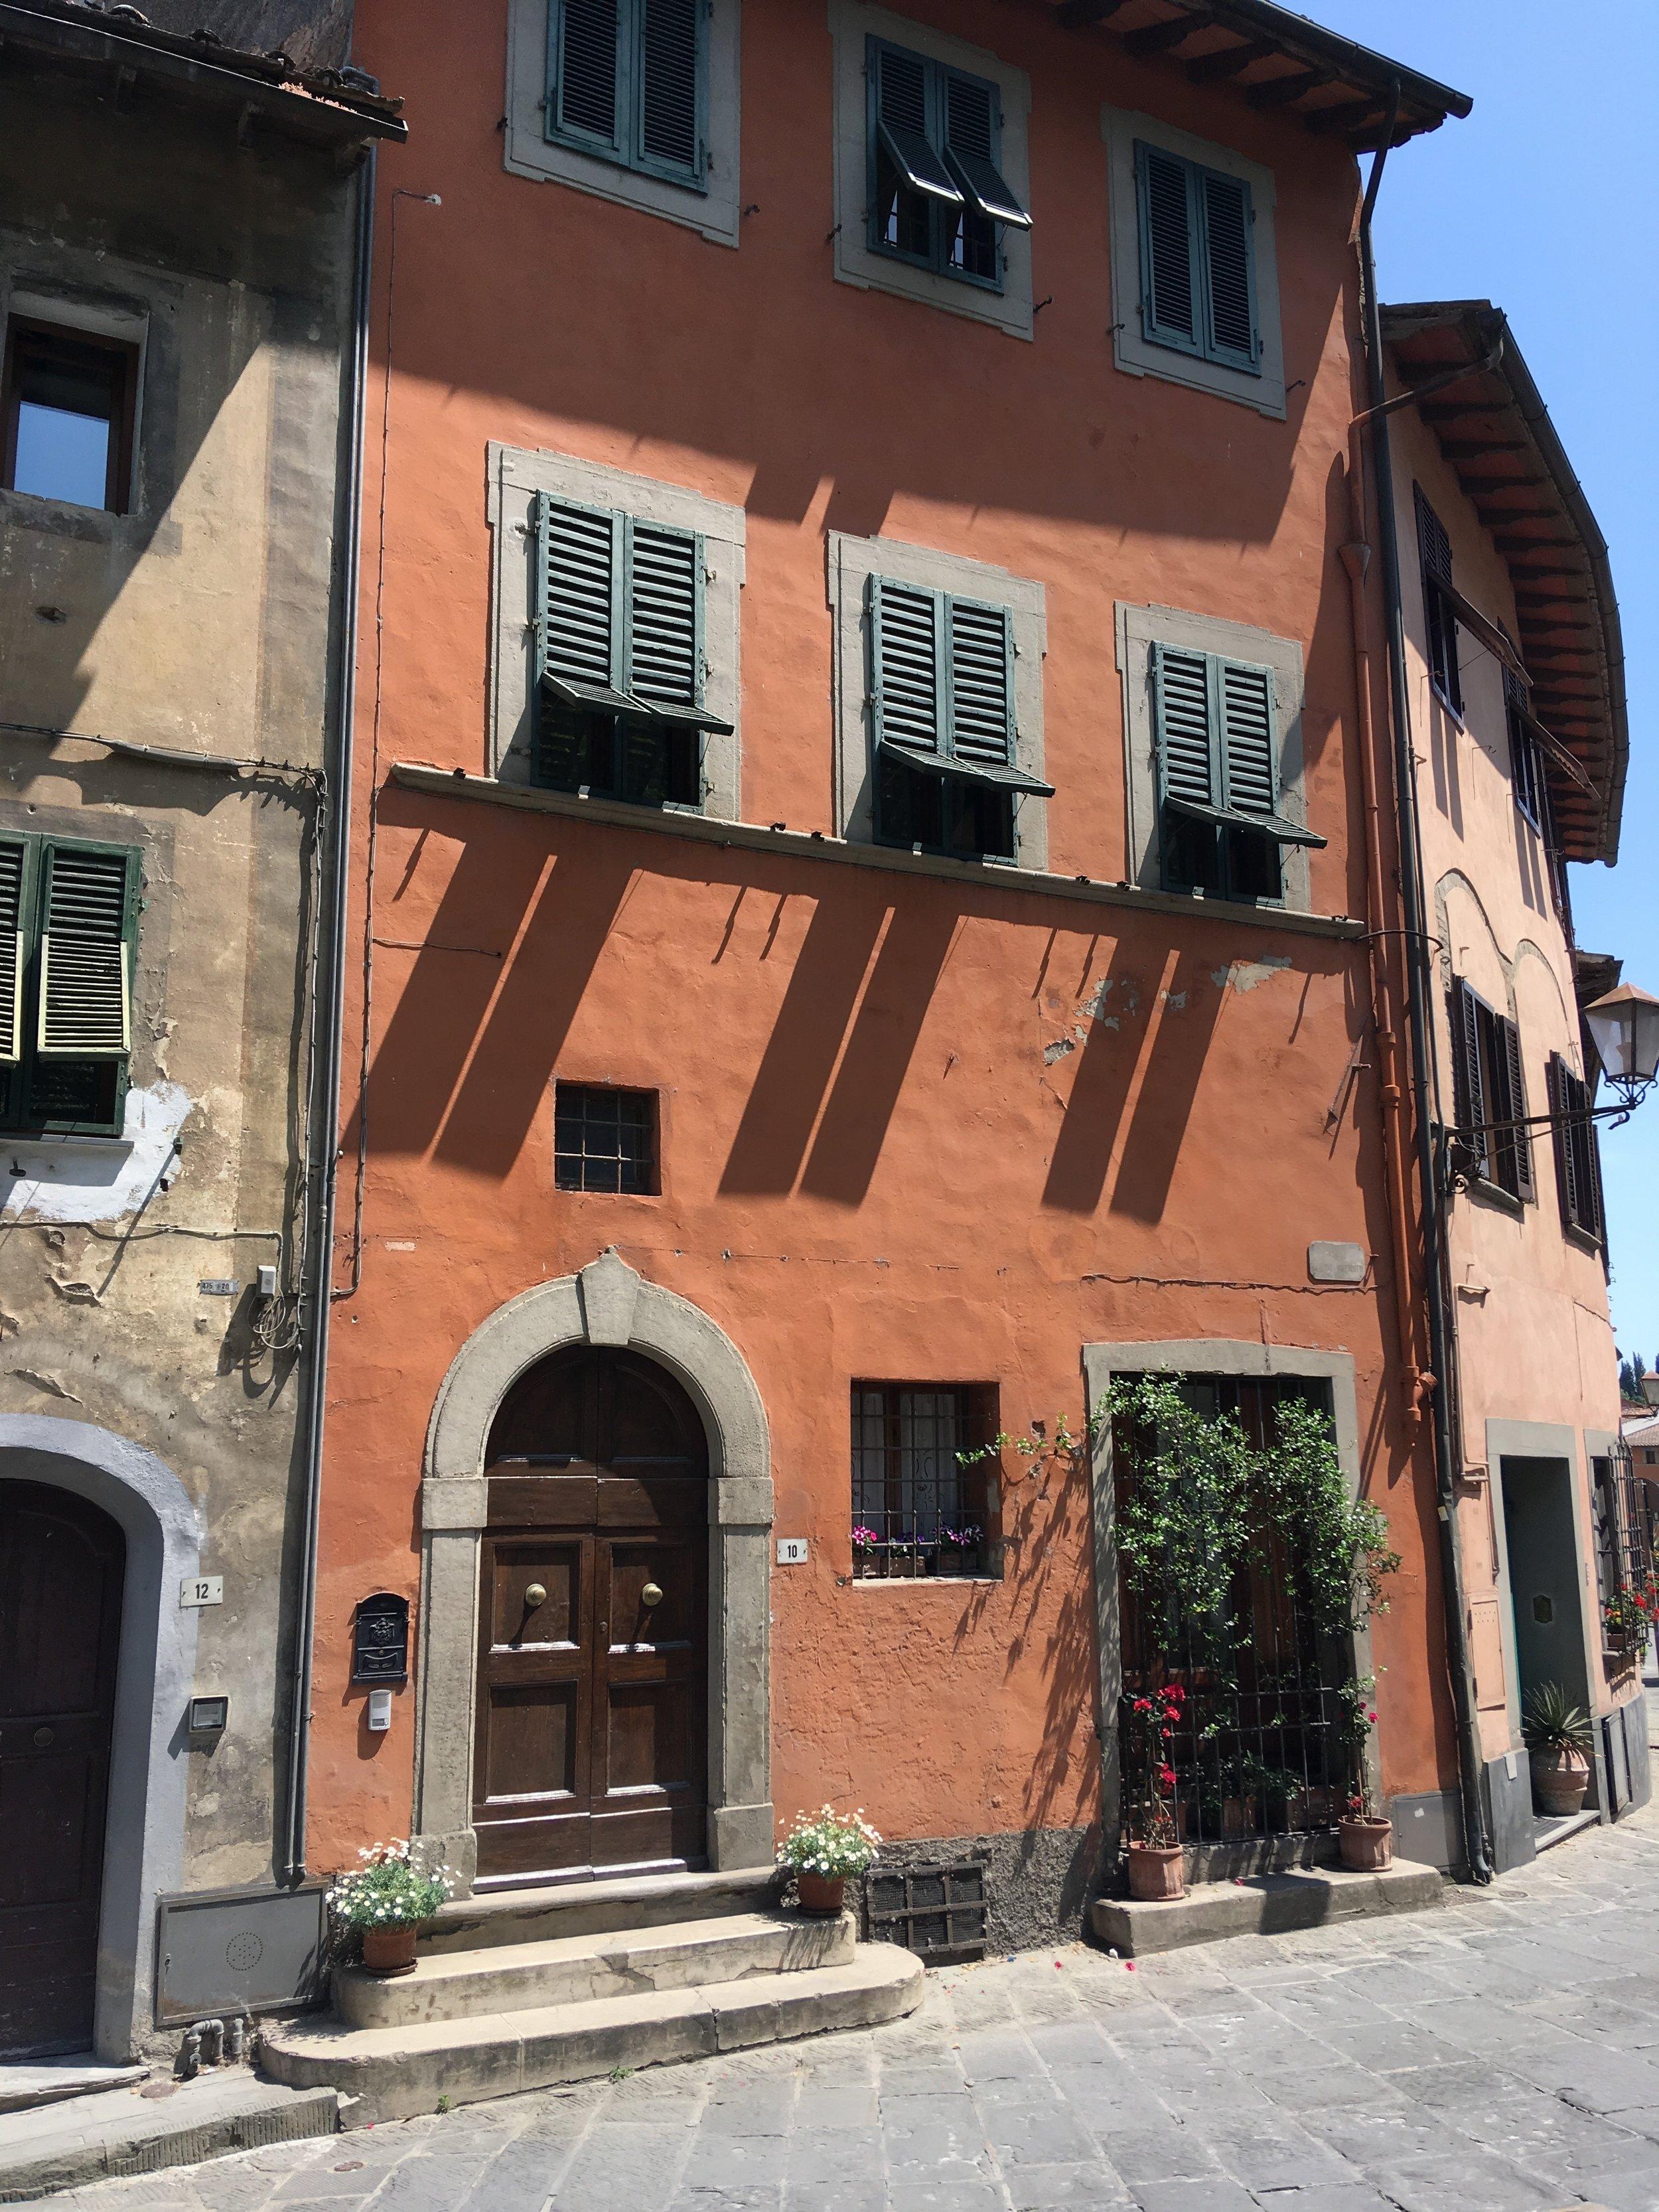 san miniato tuscany emma block  orange house.JPG